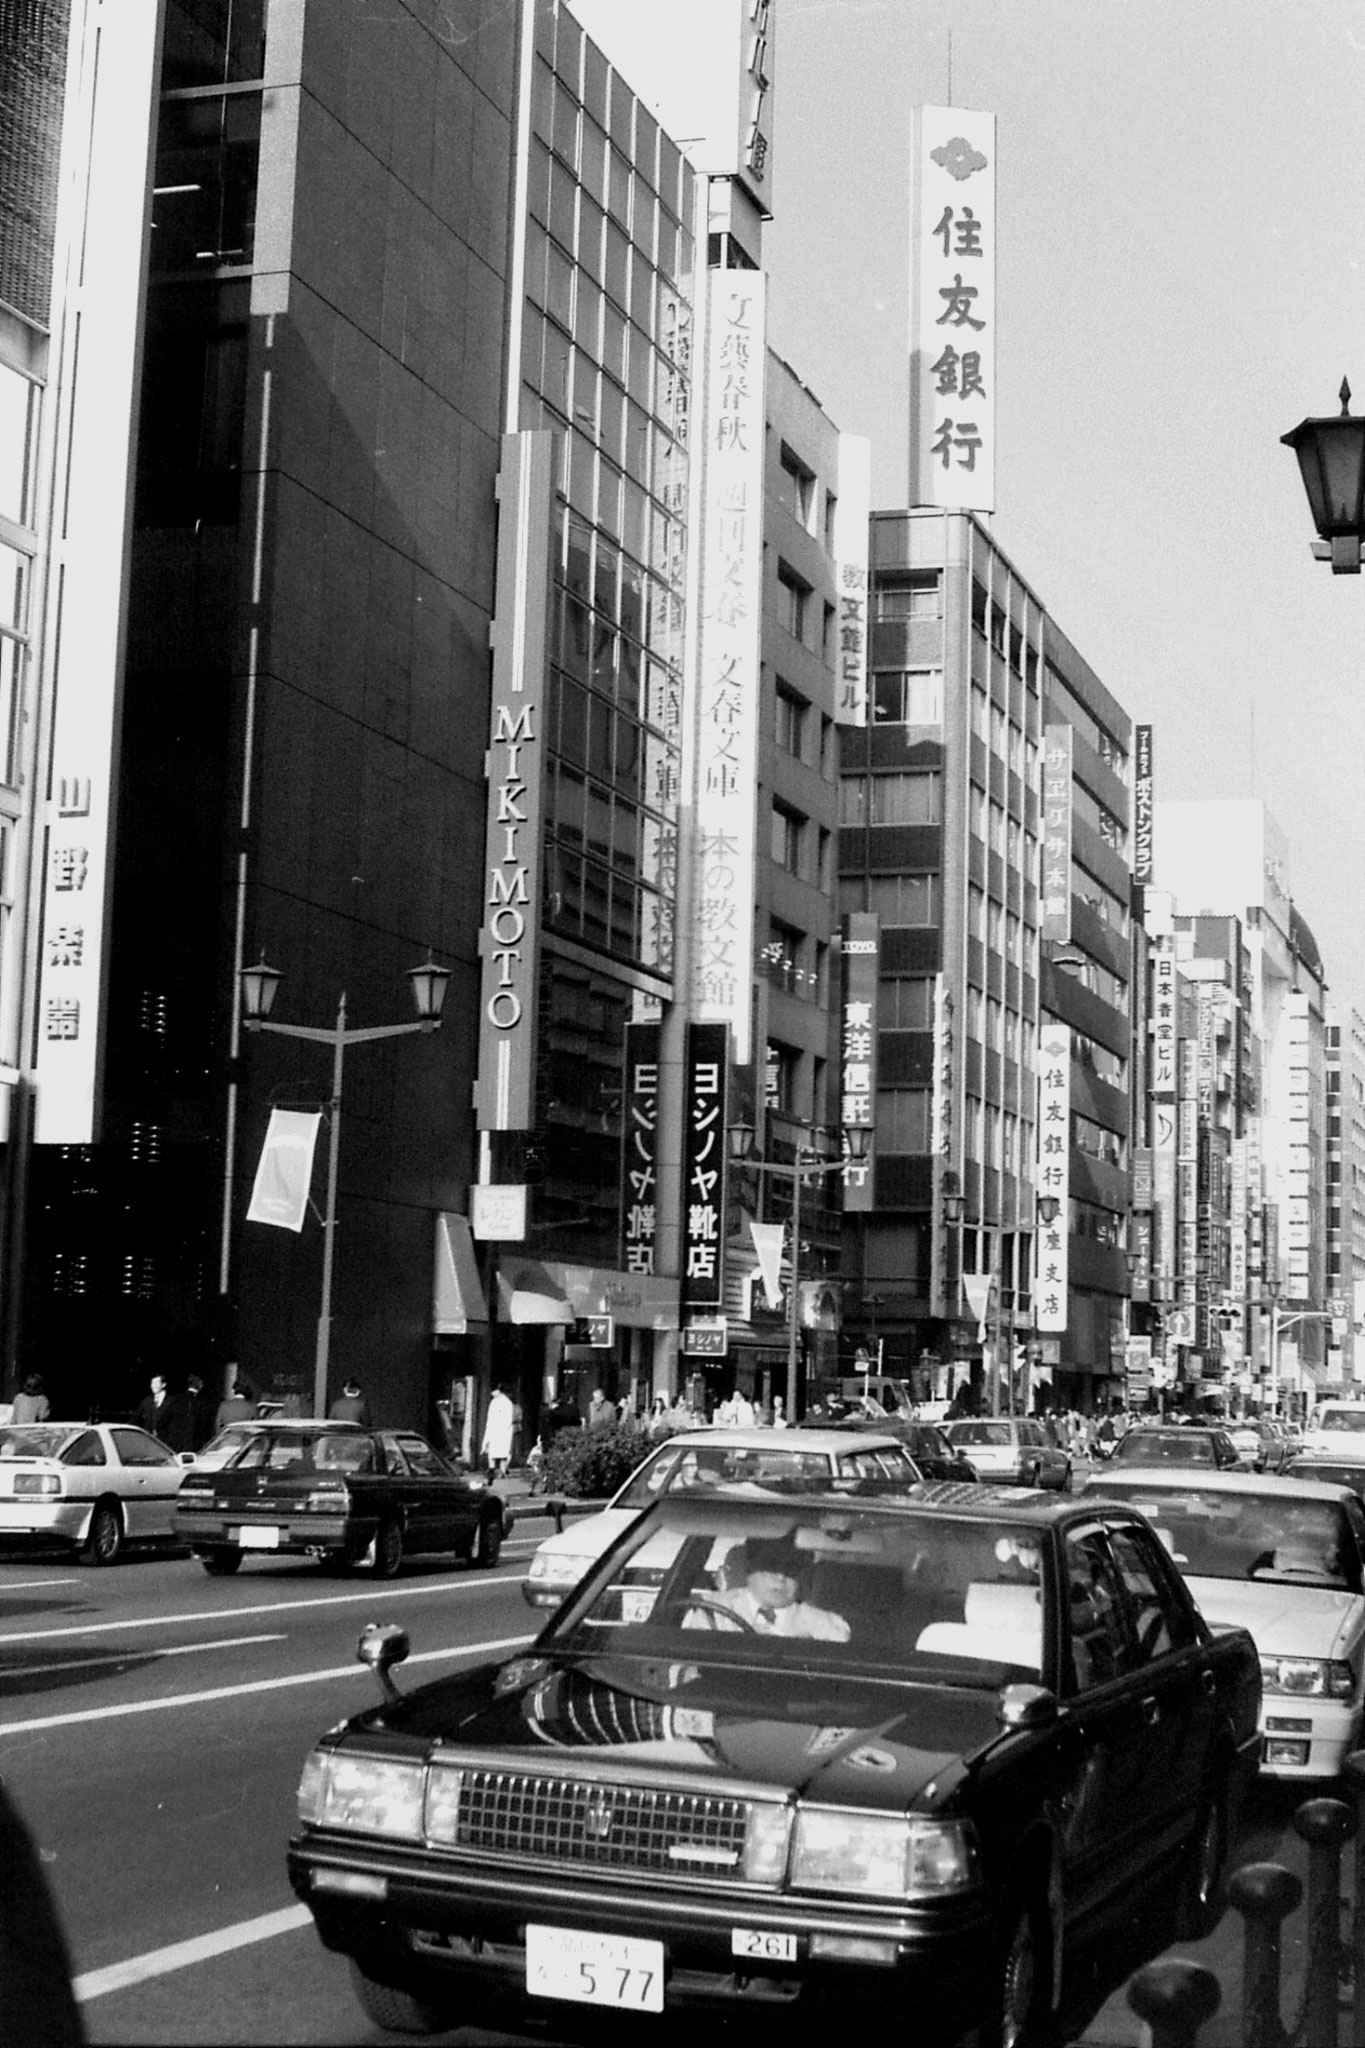 23/12/1988: 21: Tokyo